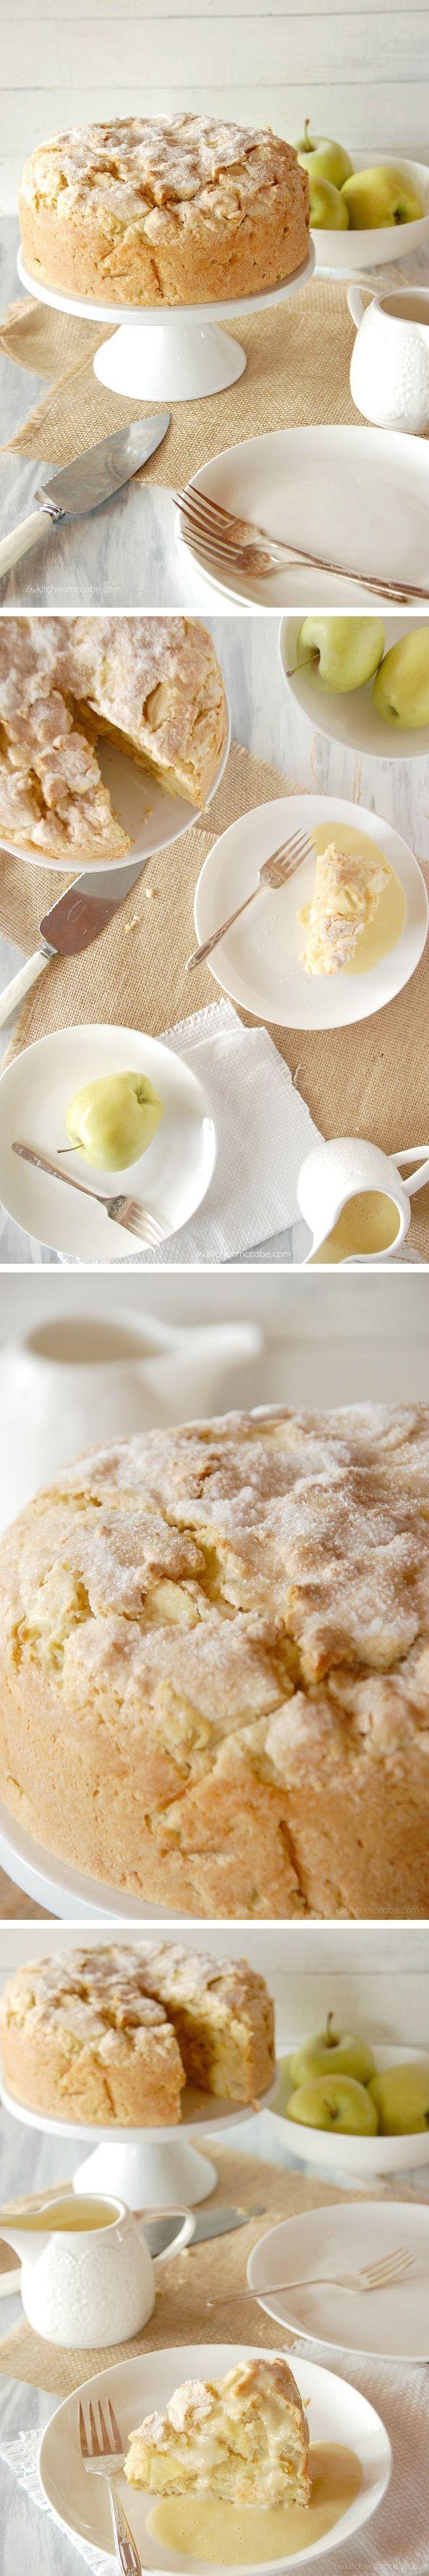 Bizcocho de manzana irlandés - Pecados de Reposteria